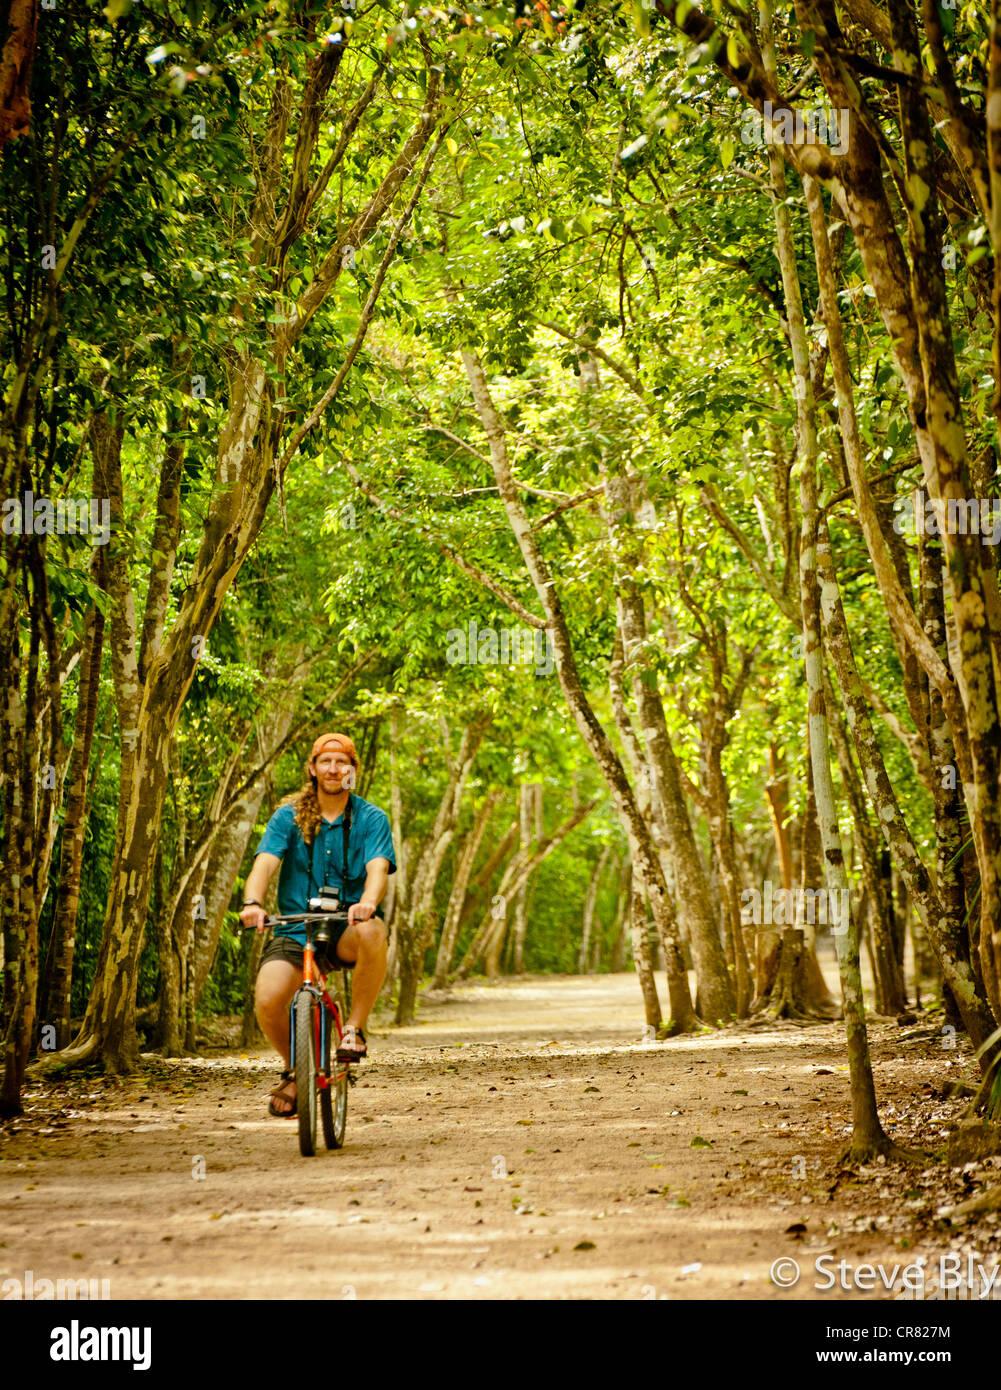 Tourist enjoys the bike ride on the 'sacbe' (white road) to the Coba Maya Ruins, Yucatan Penisula, Quintana - Stock Image